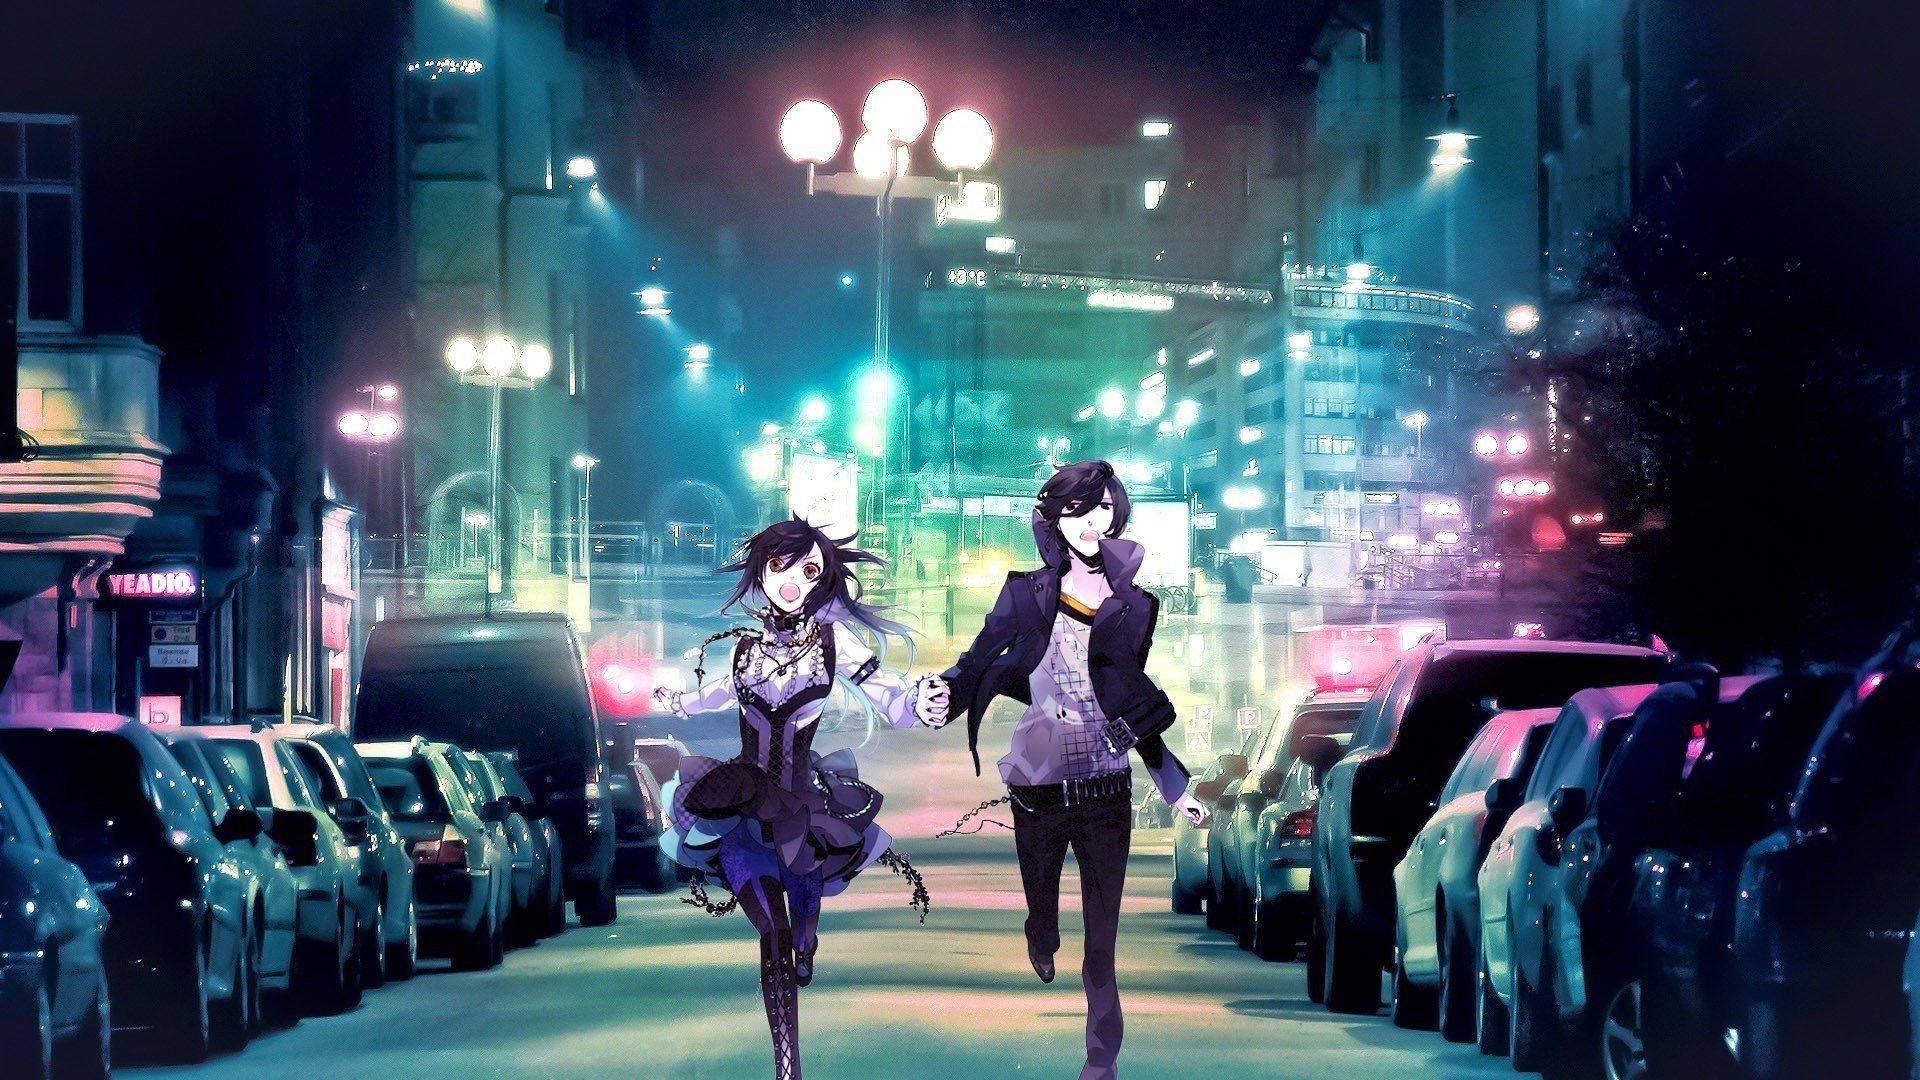 Dark Anime Scenery Wallpaper Hd Cool 7 Anime Scenery City Scenery Anime Scenery Wallpaper